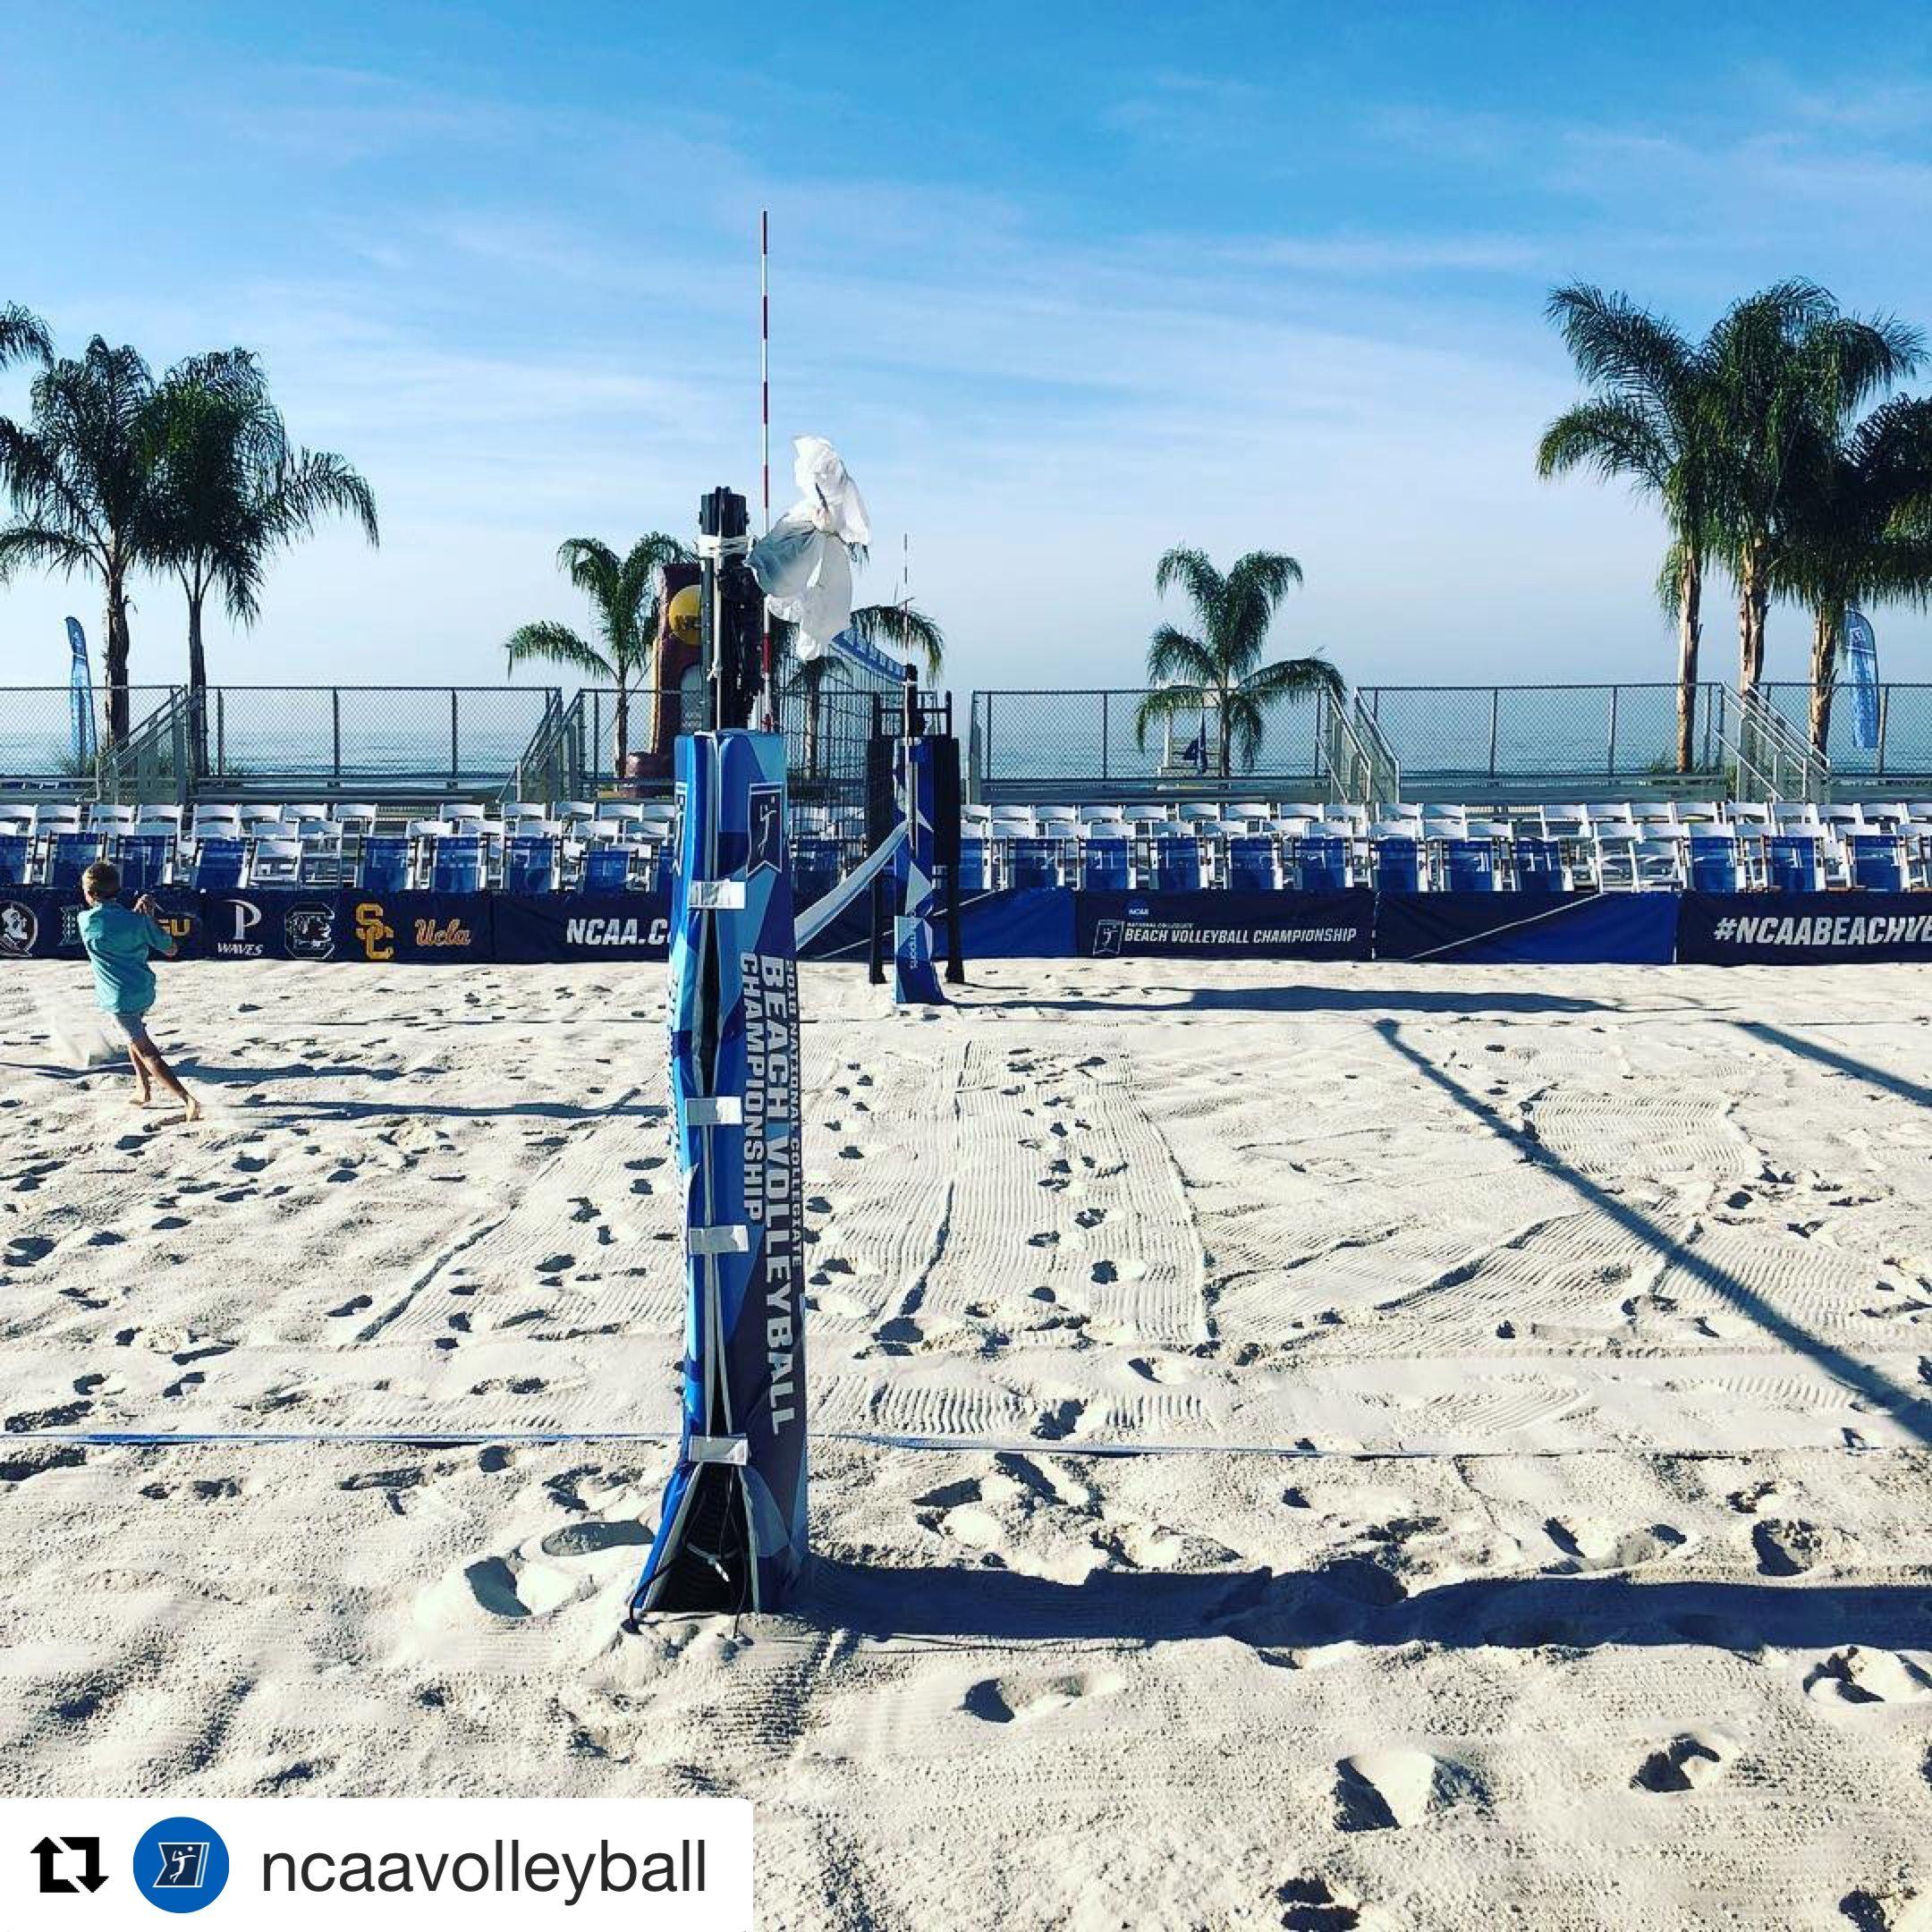 2018 Ncaa Beach Volleyball Championship In Gulf Shores Alabama